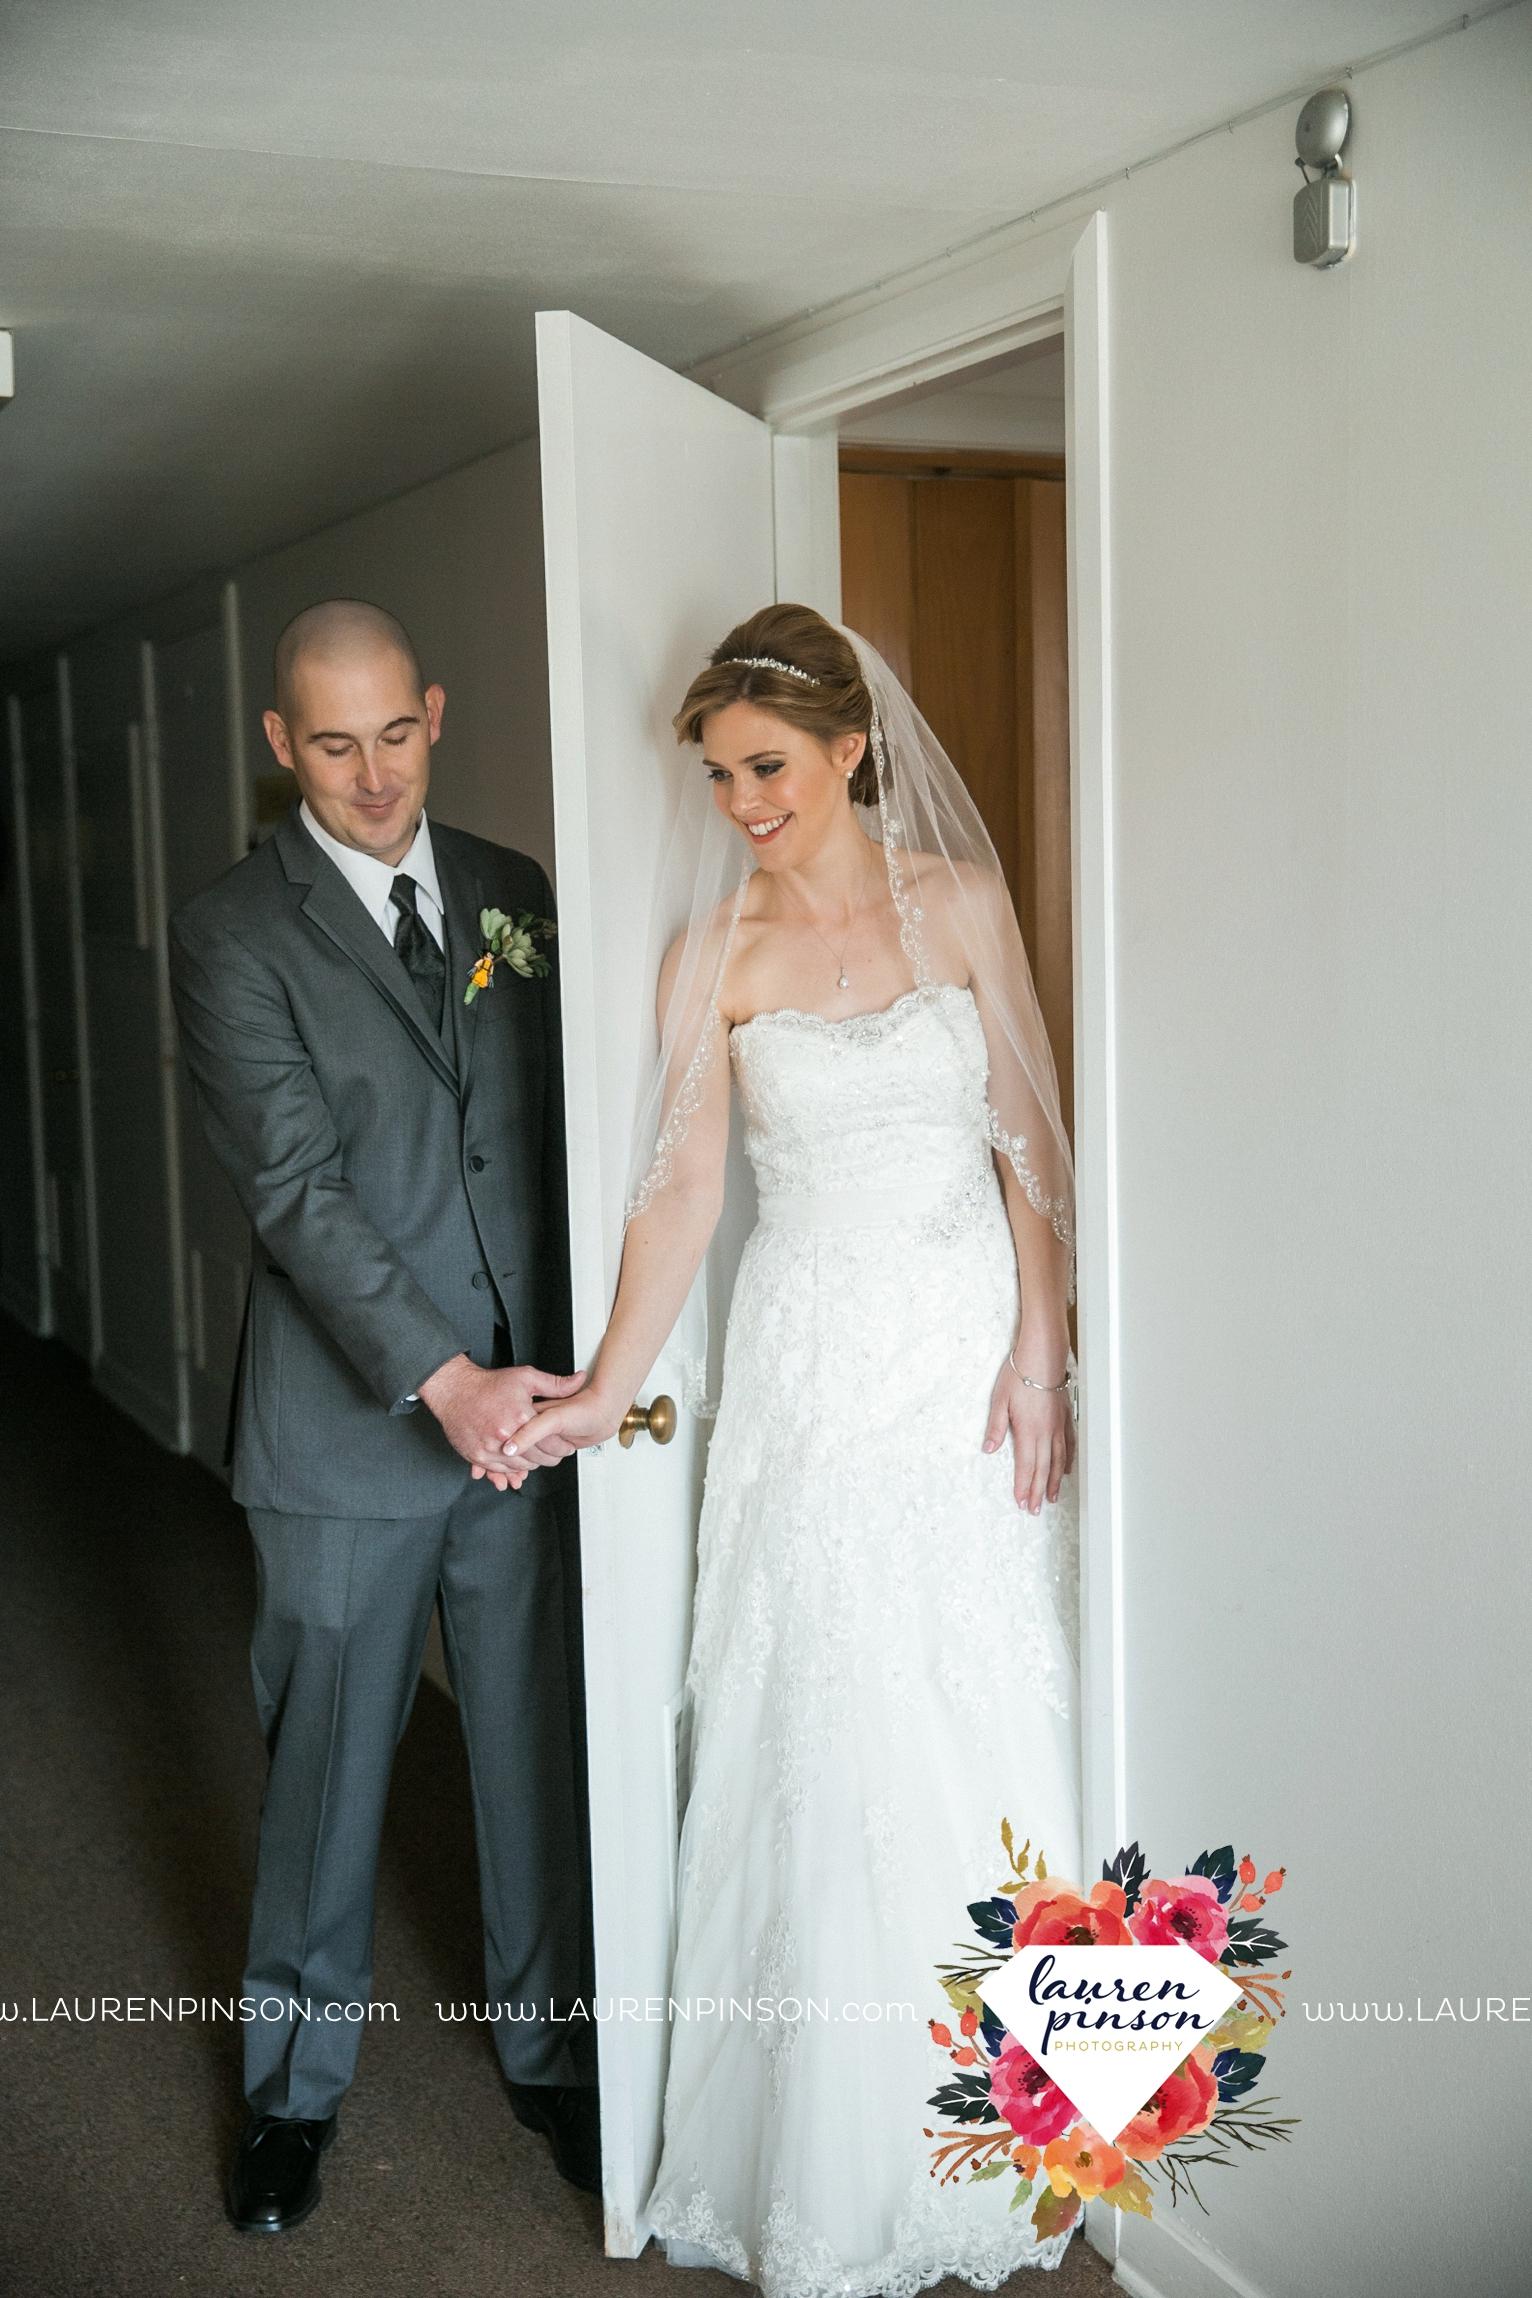 kemp-center-for-the-arts-wichita-falls-texas-wedding-photographer-fall-wedding-pumpkins-131.jpg